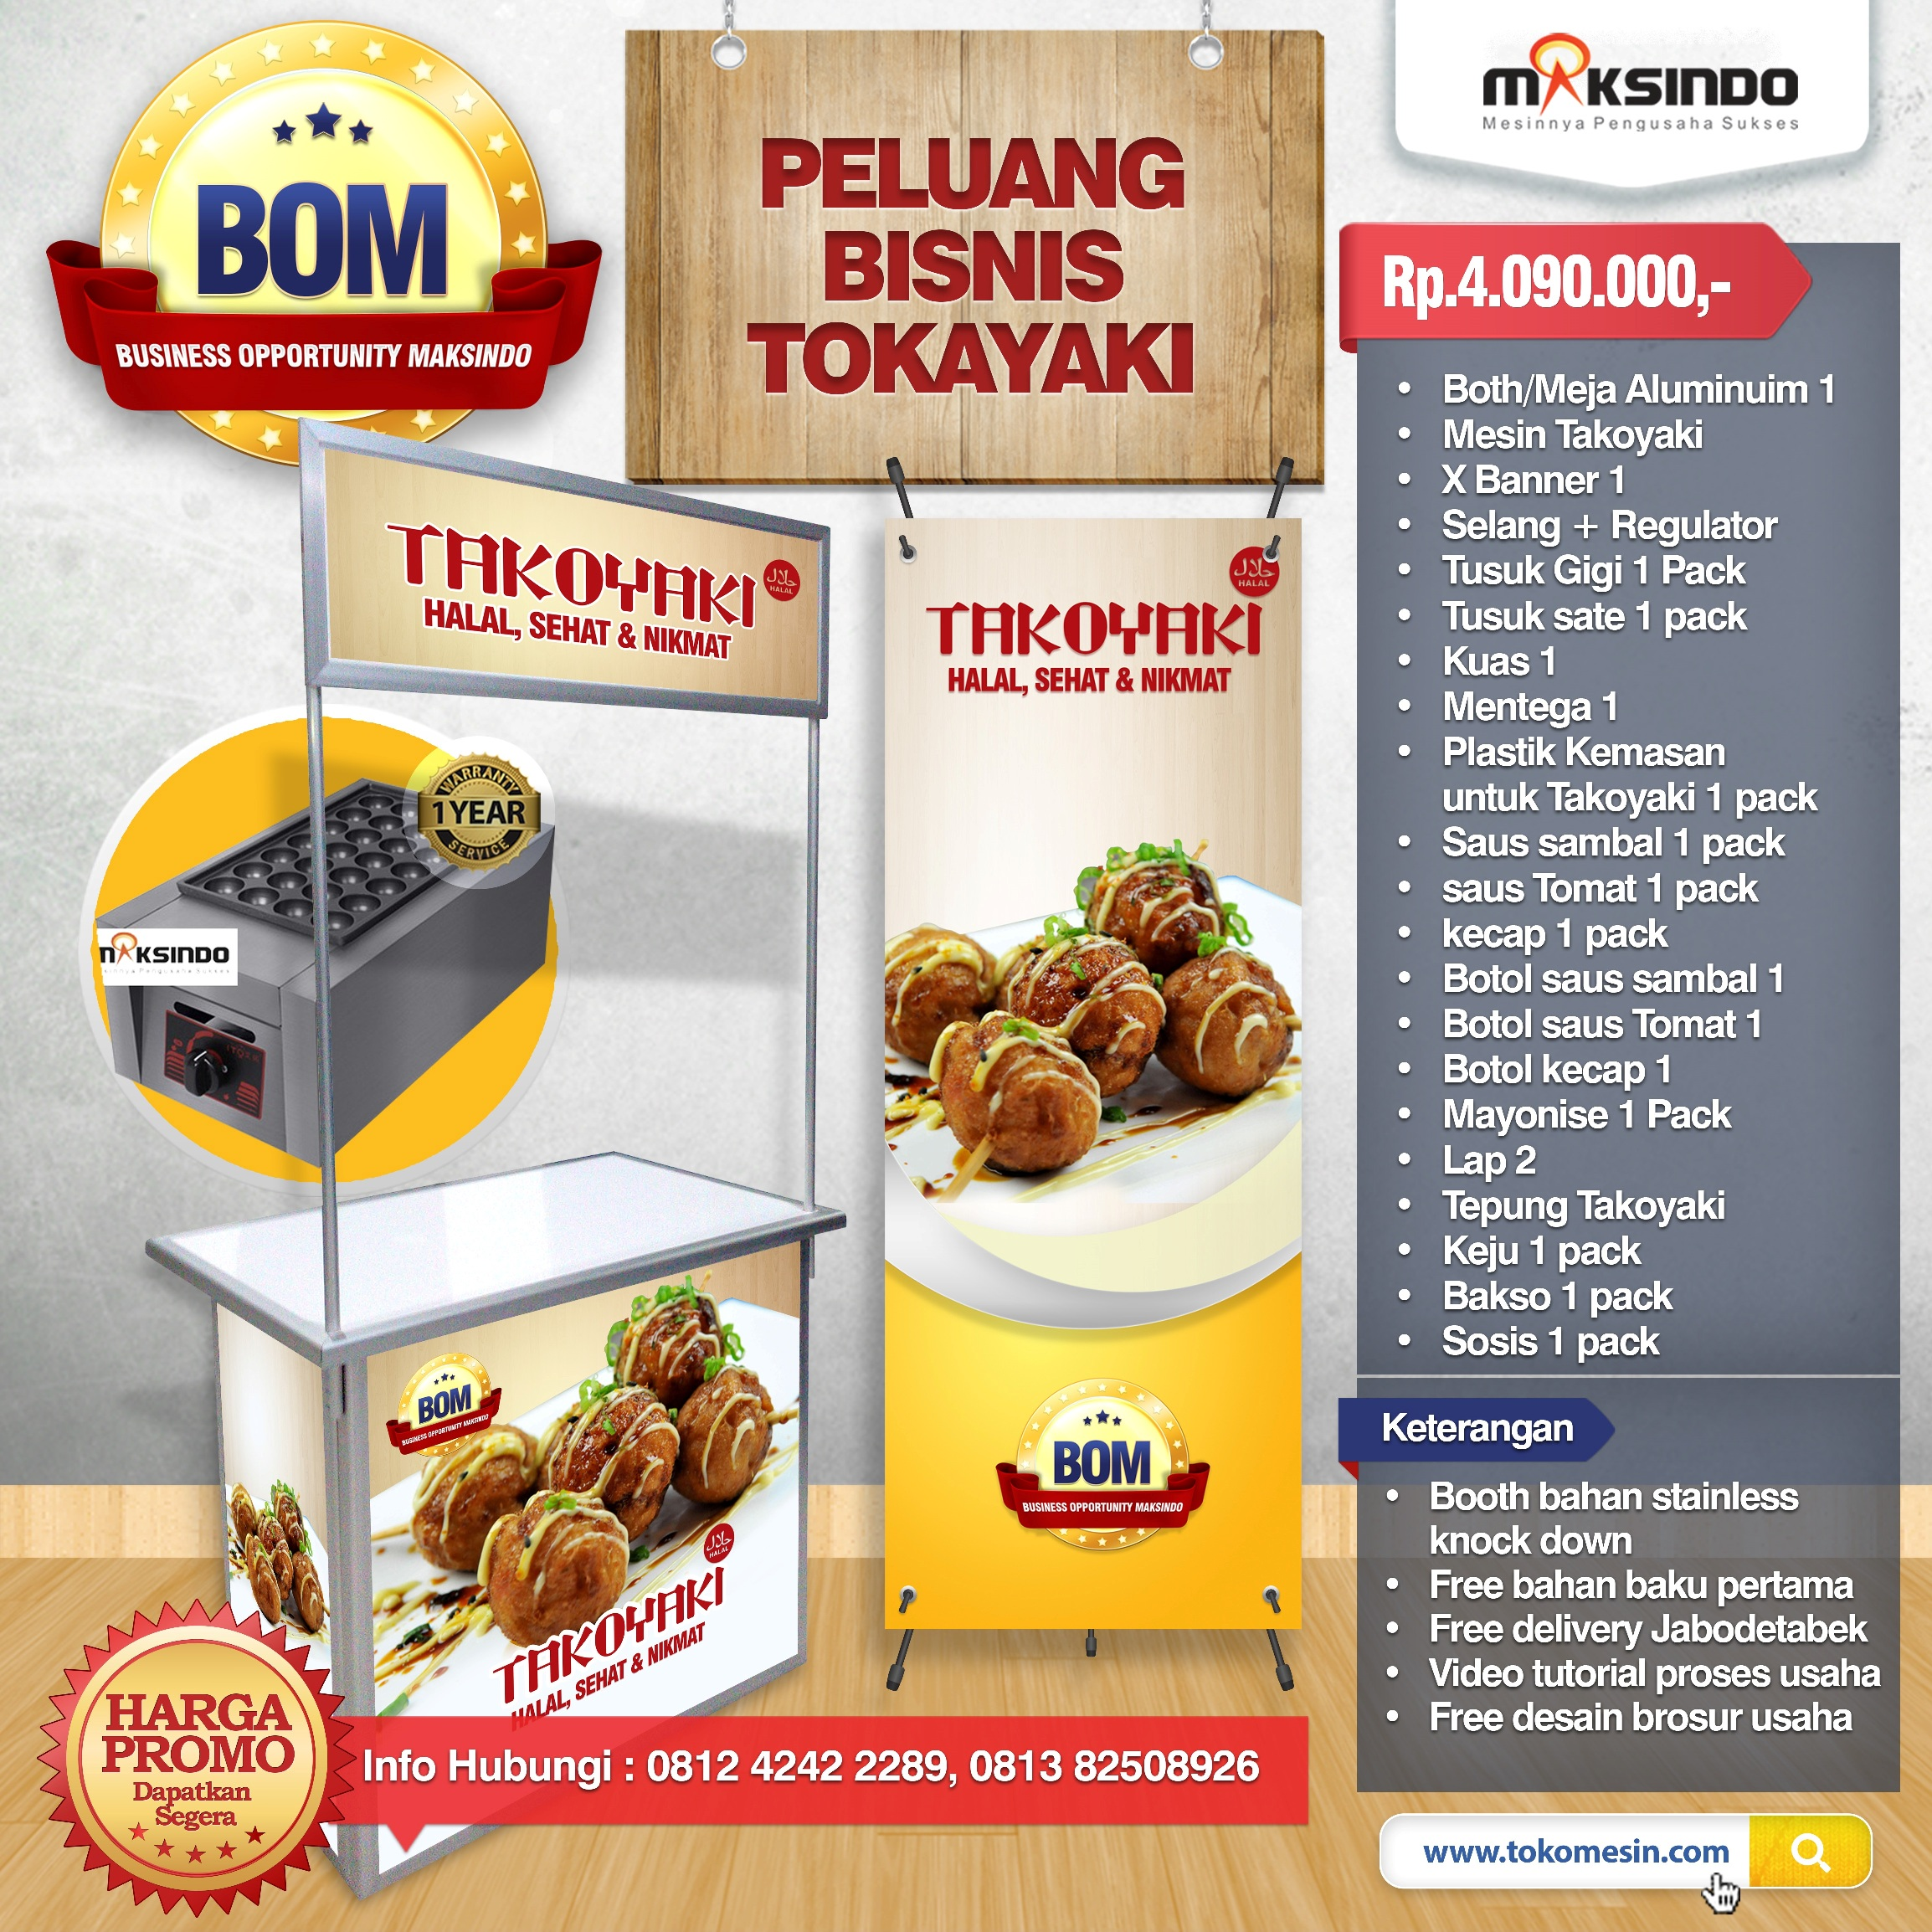 Paket Usaha Takoyaki Progam BOM